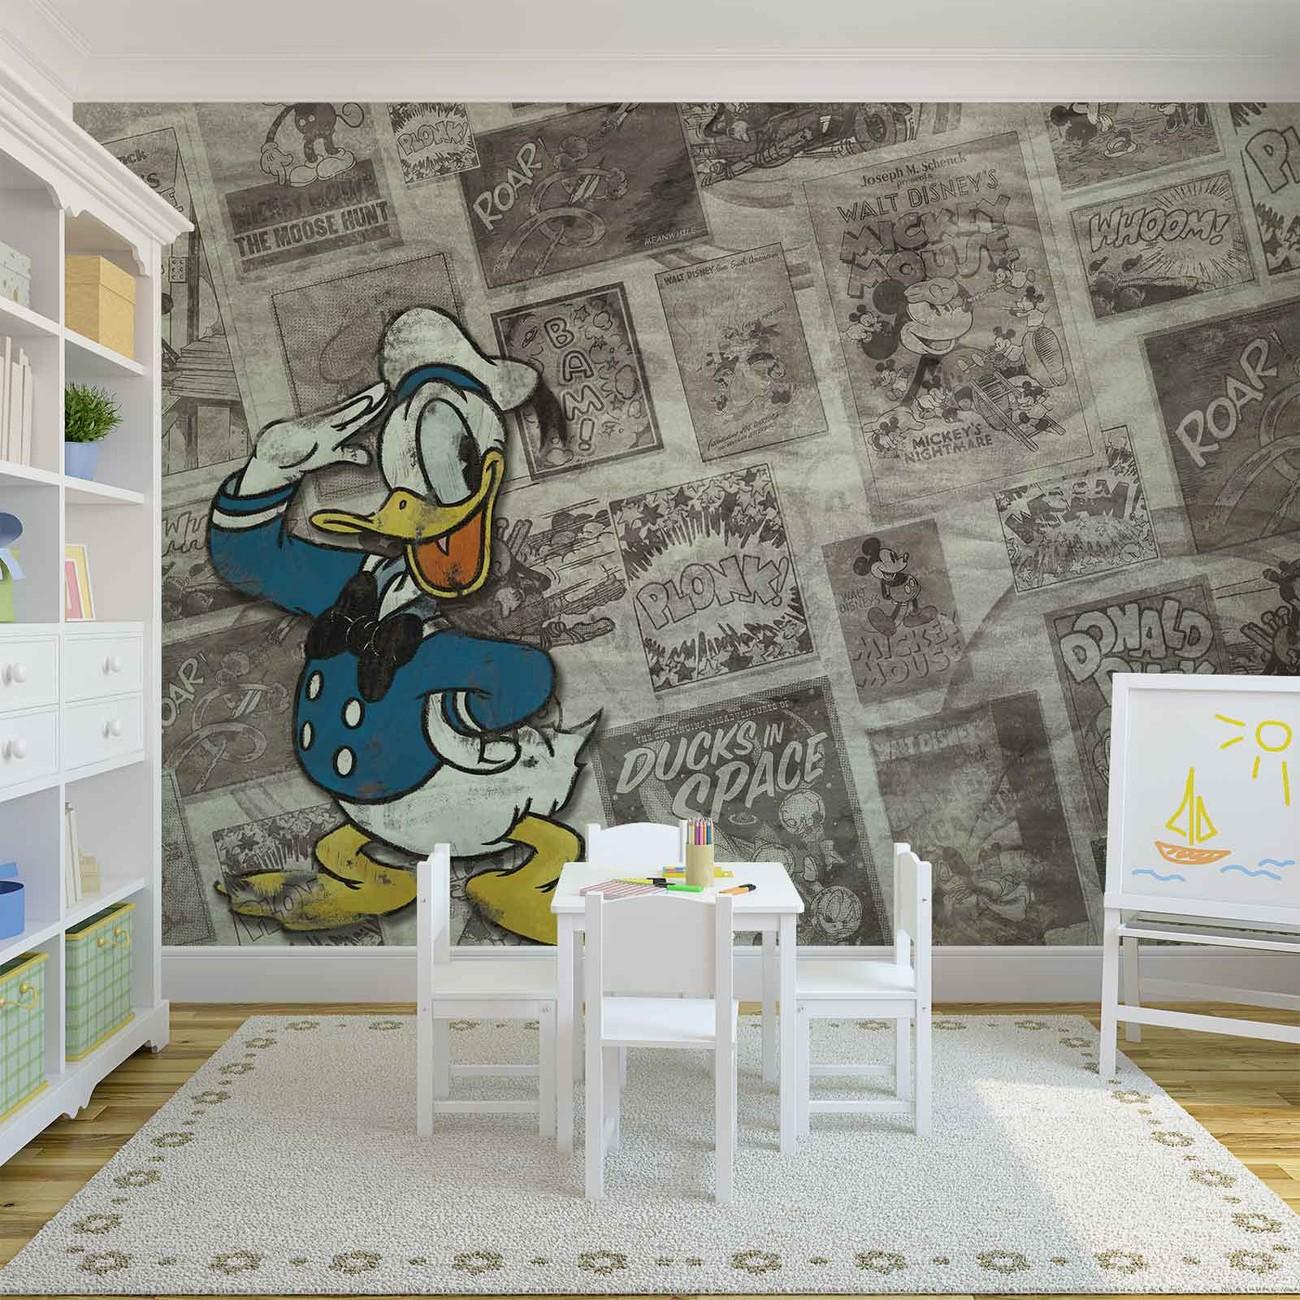 Disney donal duck papier journal vintage poster mural - Poster mural sur mesure ...